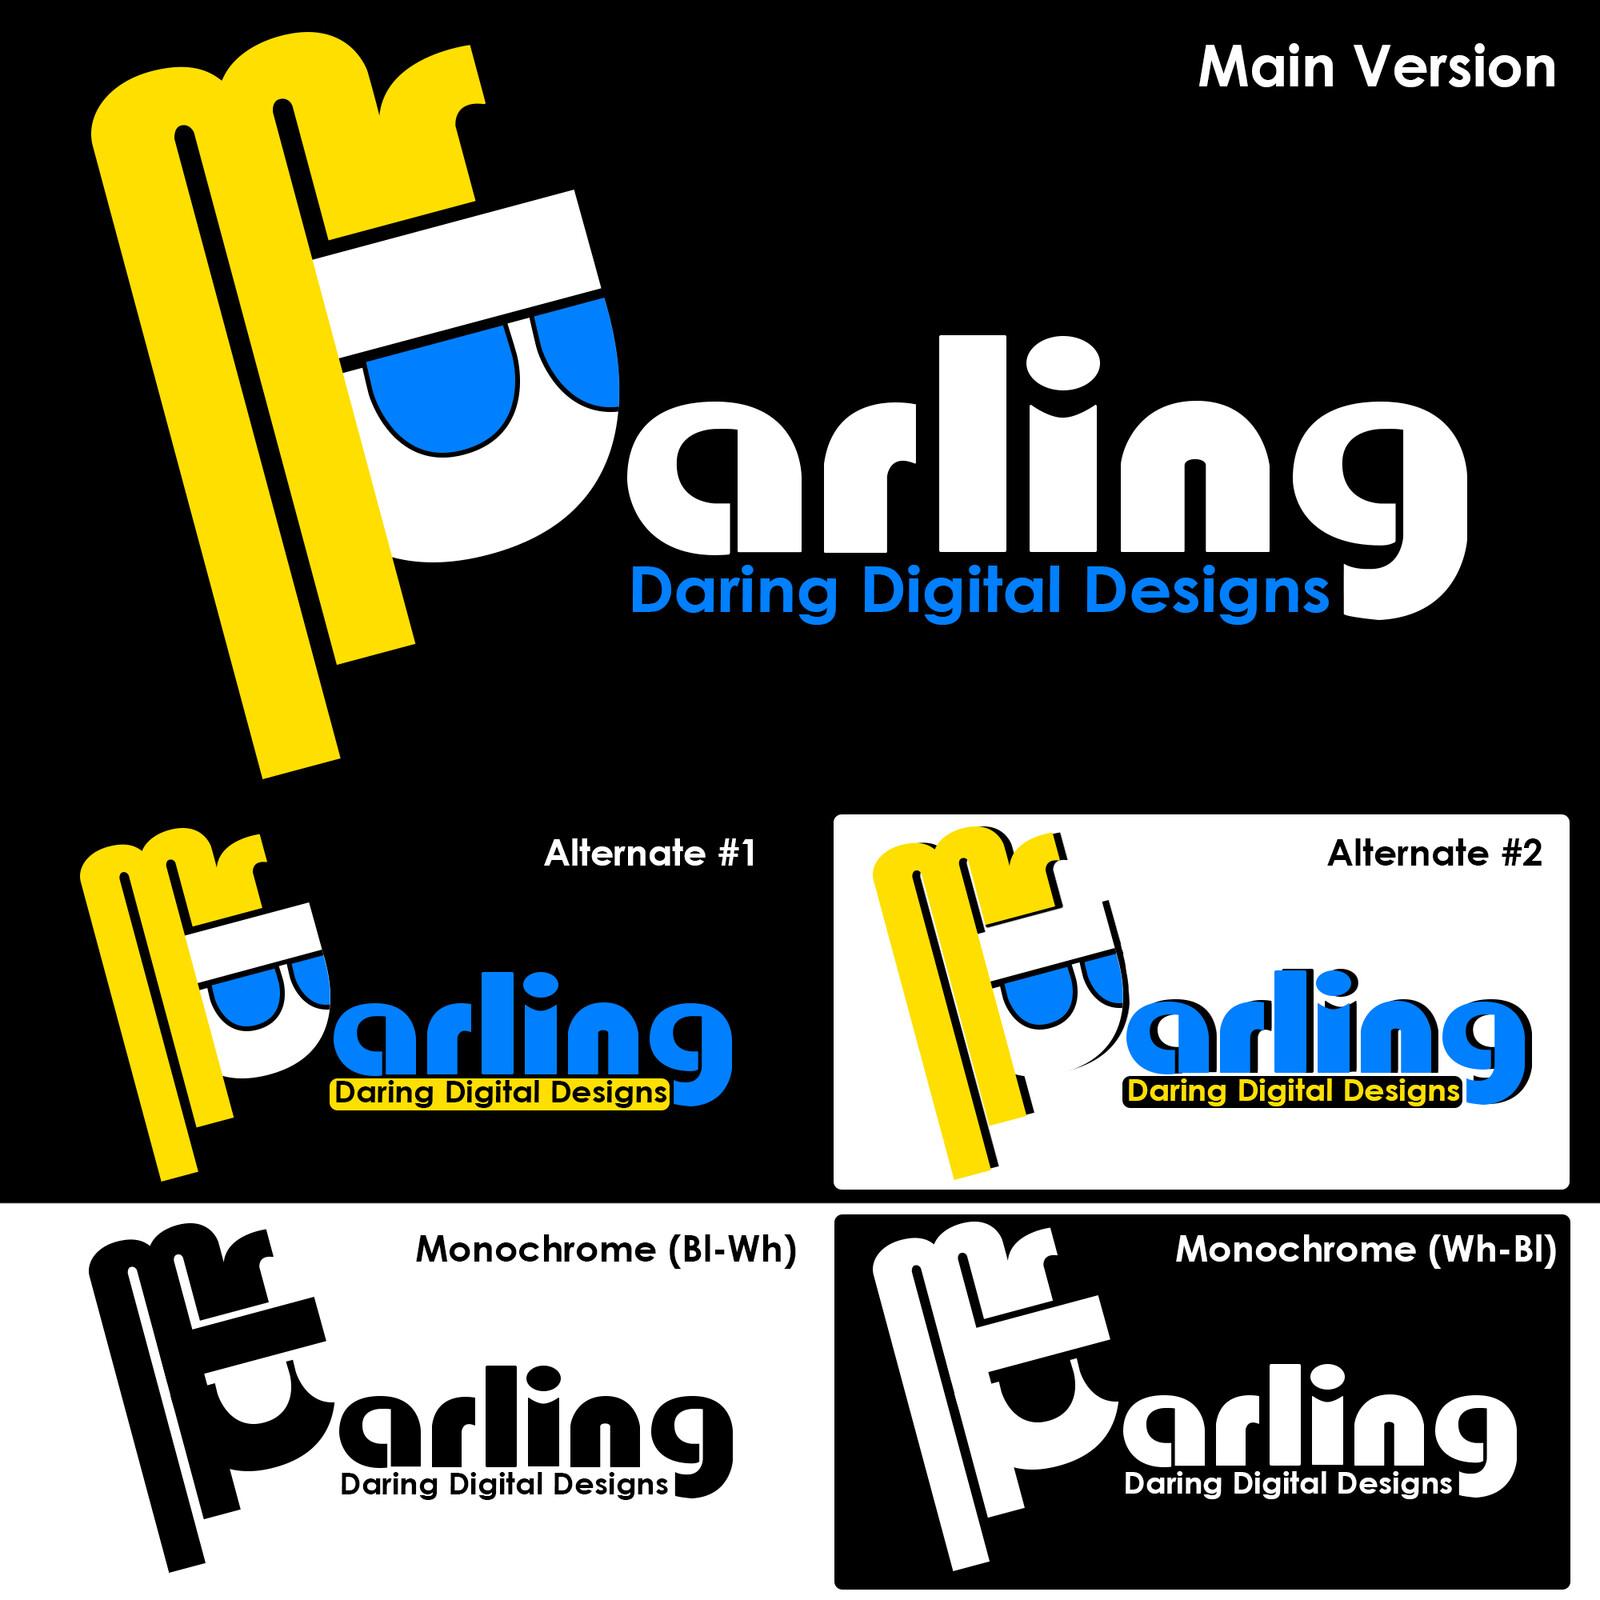 Mr_Darling Logotypes #1